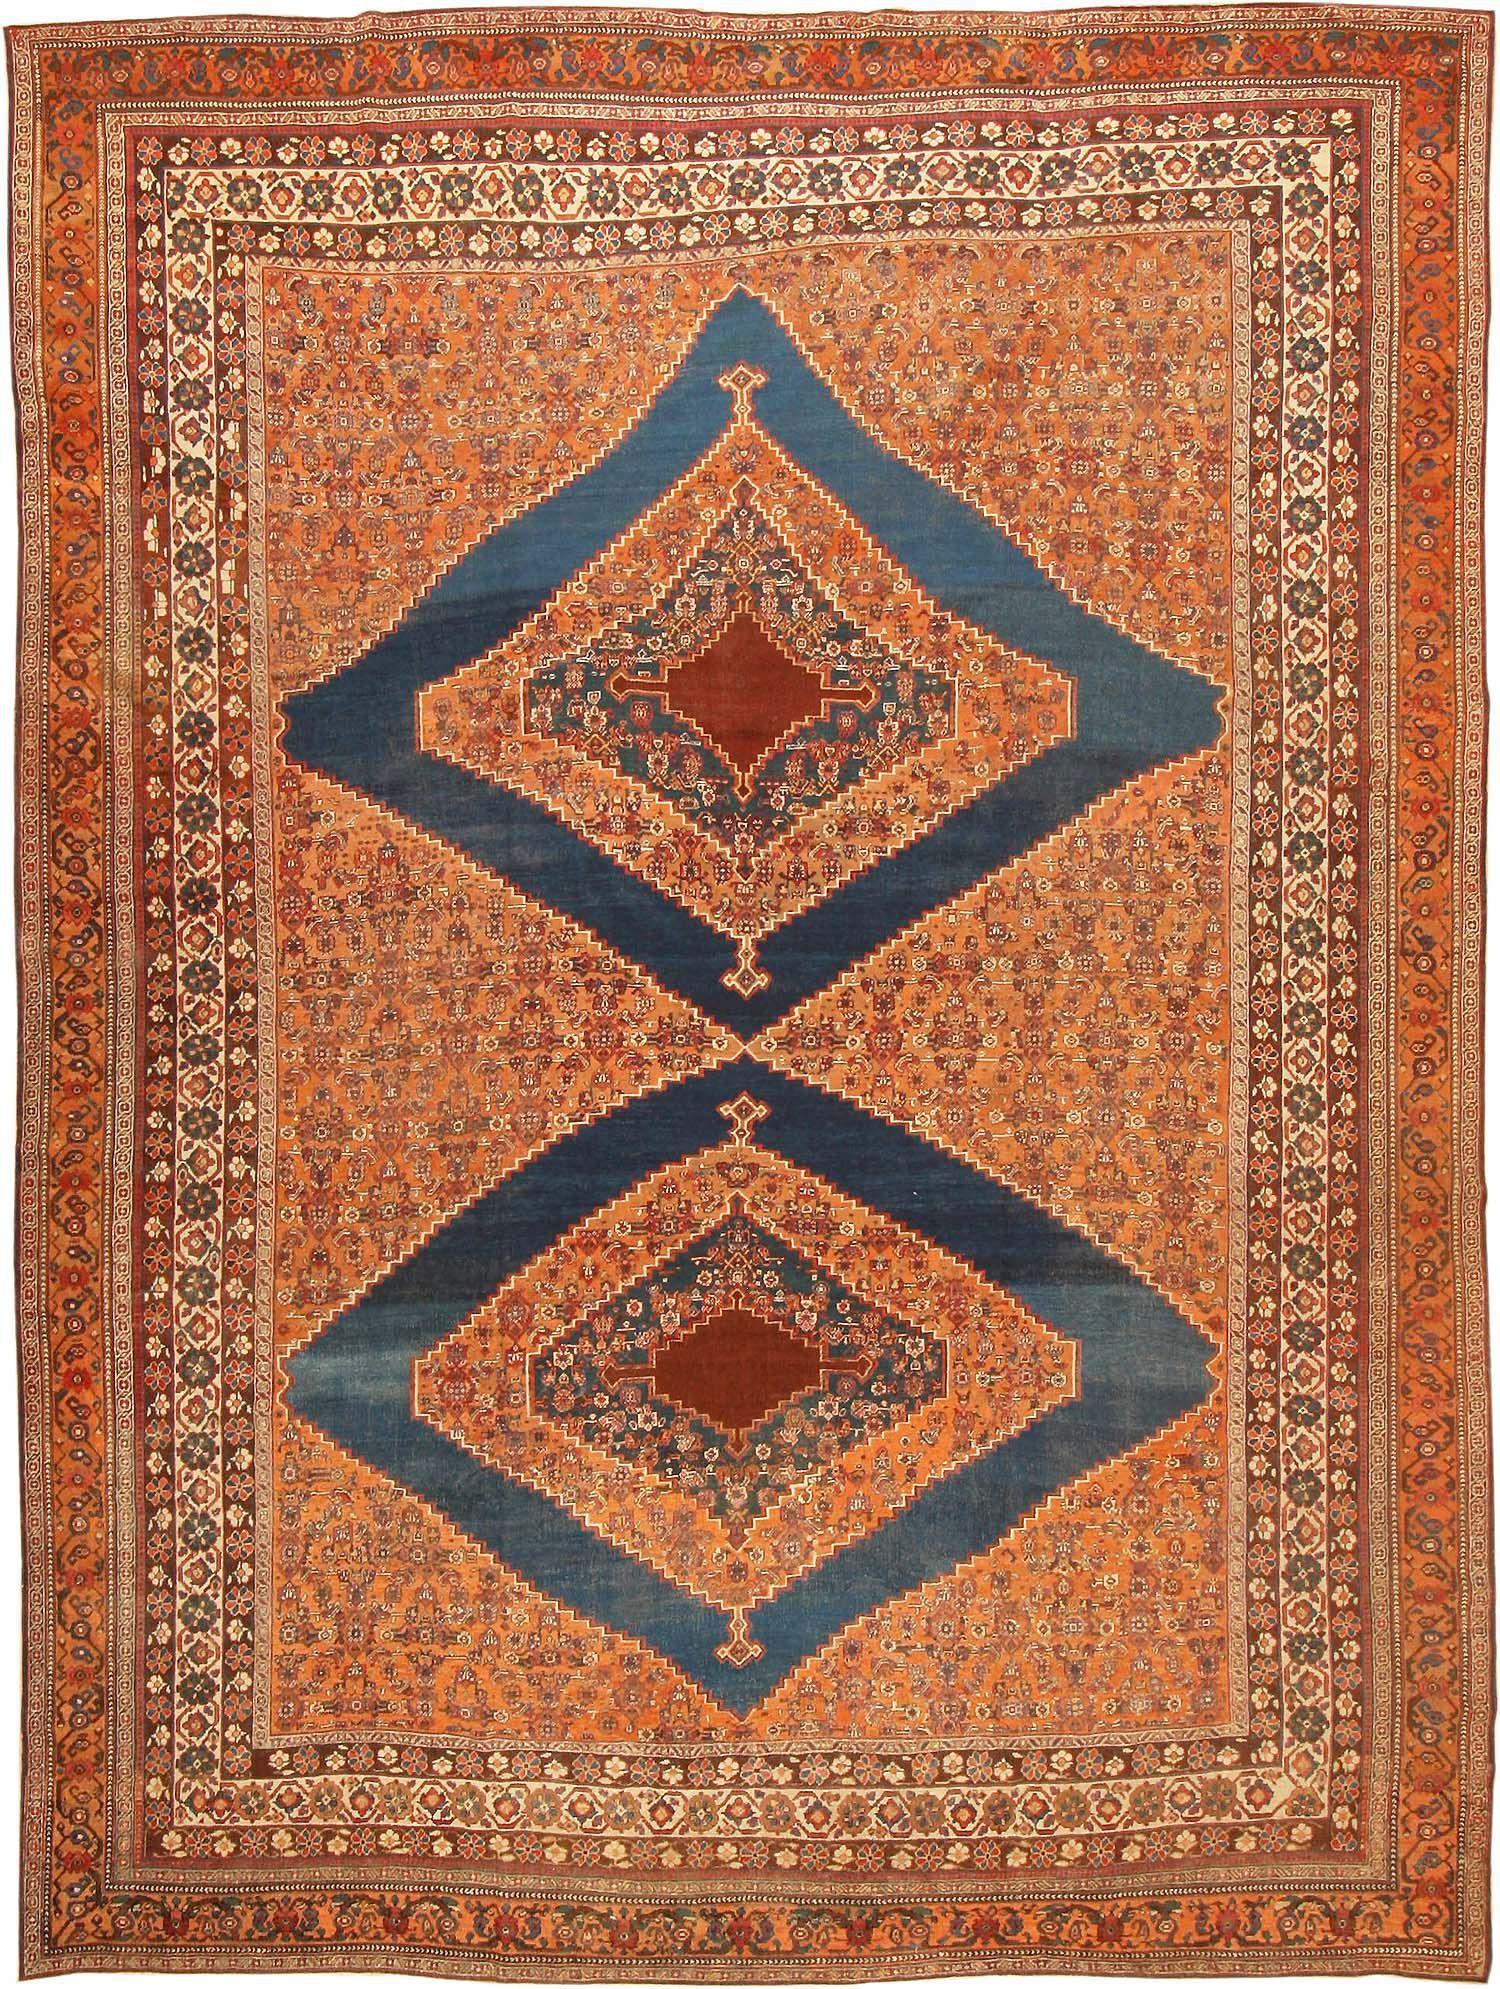 Antique Afshar Rug 1668 By Nazmiyal In New York City Antique Persian Carpet Rugs Antique Persian Rug